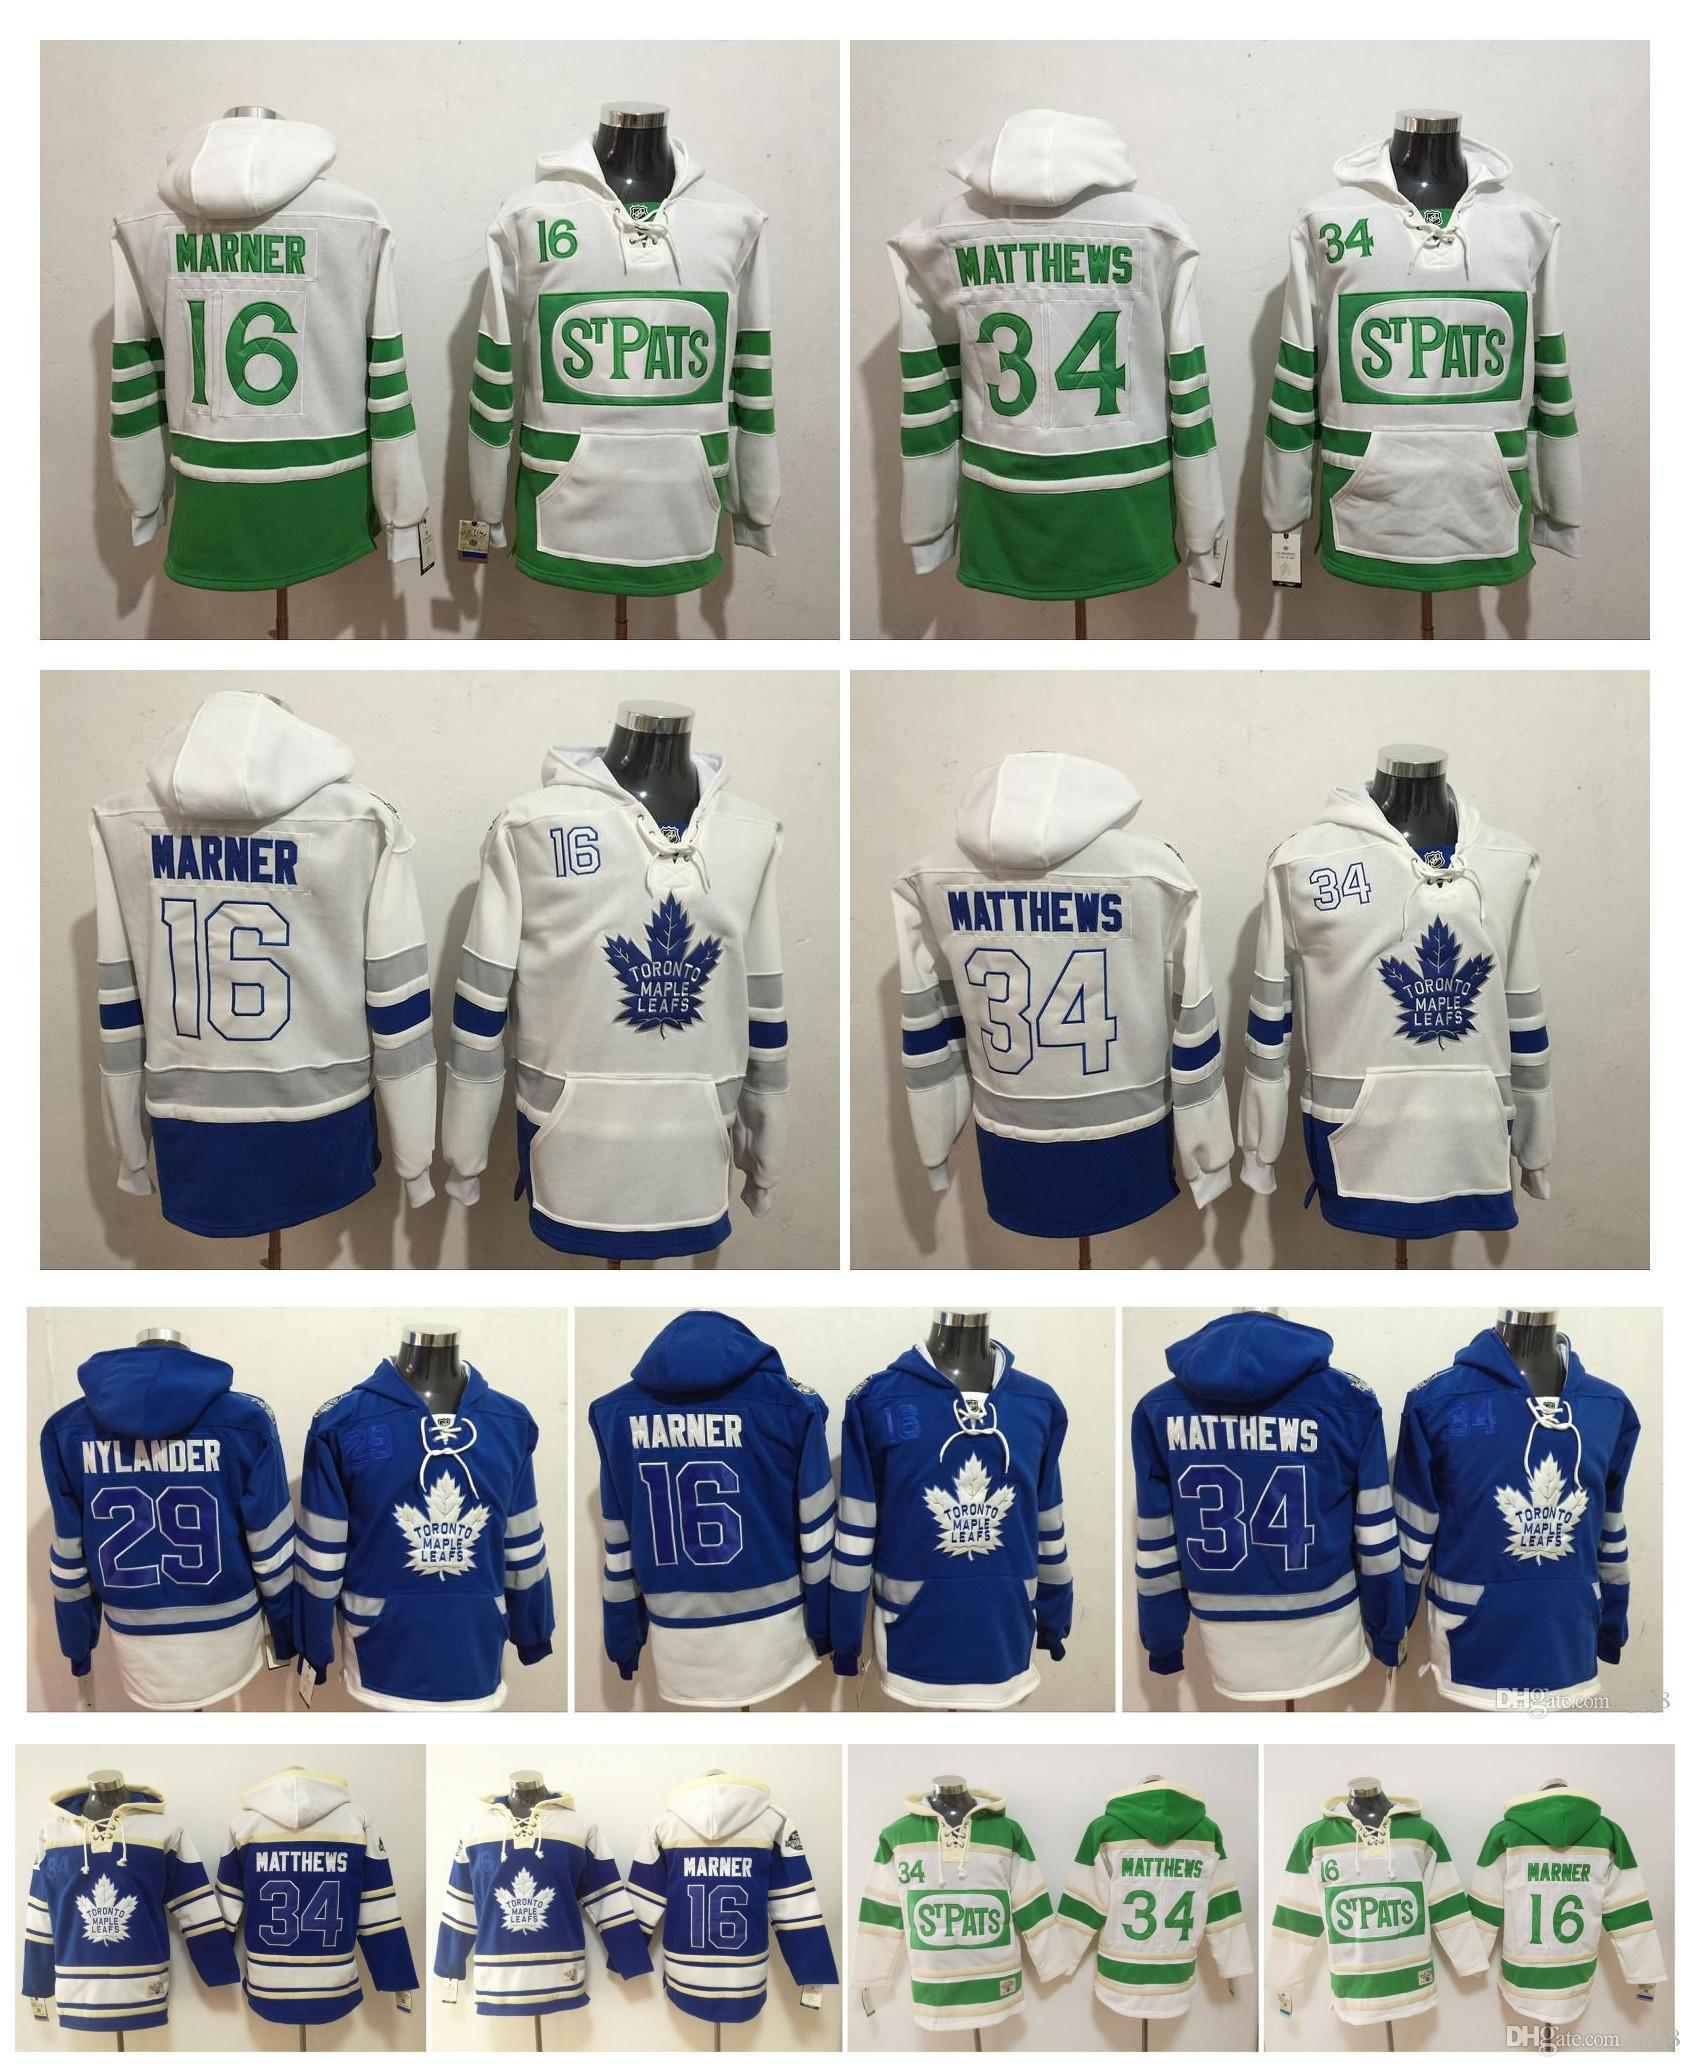 ... Doug Gilmour Jersey 93 Toronto Hockey Jerseys Old Time Hockey Hoodie  Mens Double 2017 Centennial Classic 100th Toronto Maple Leafs Pullover 34  Auston ... 2e1060692